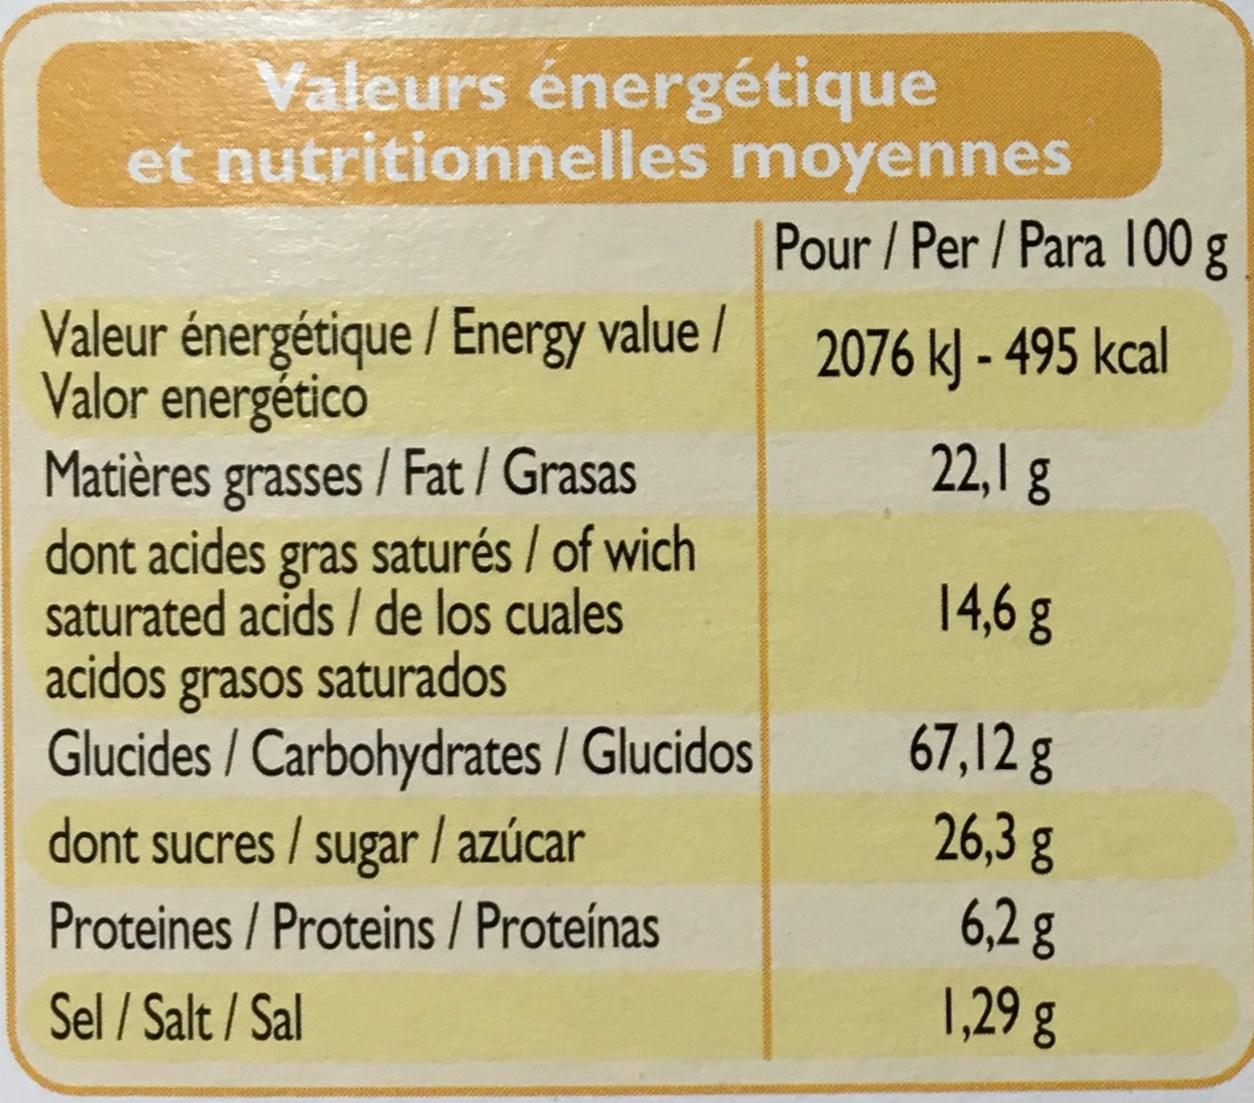 12 Maxi galettes bretonnes - Nutrition facts - fr